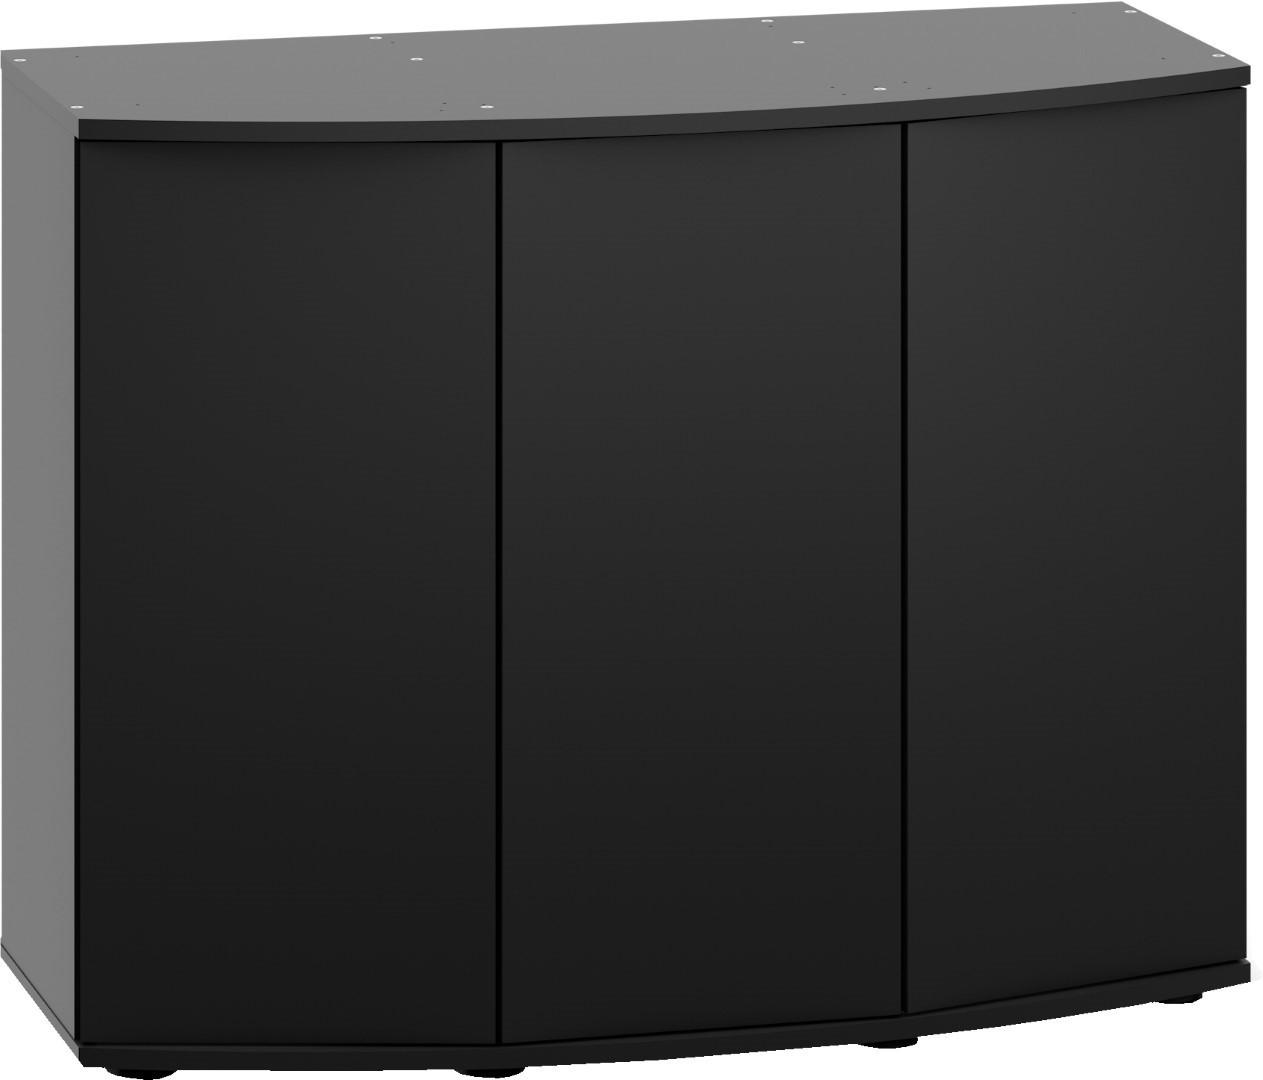 Juwel meubel bouwpakket SBX Vision 180 zwart